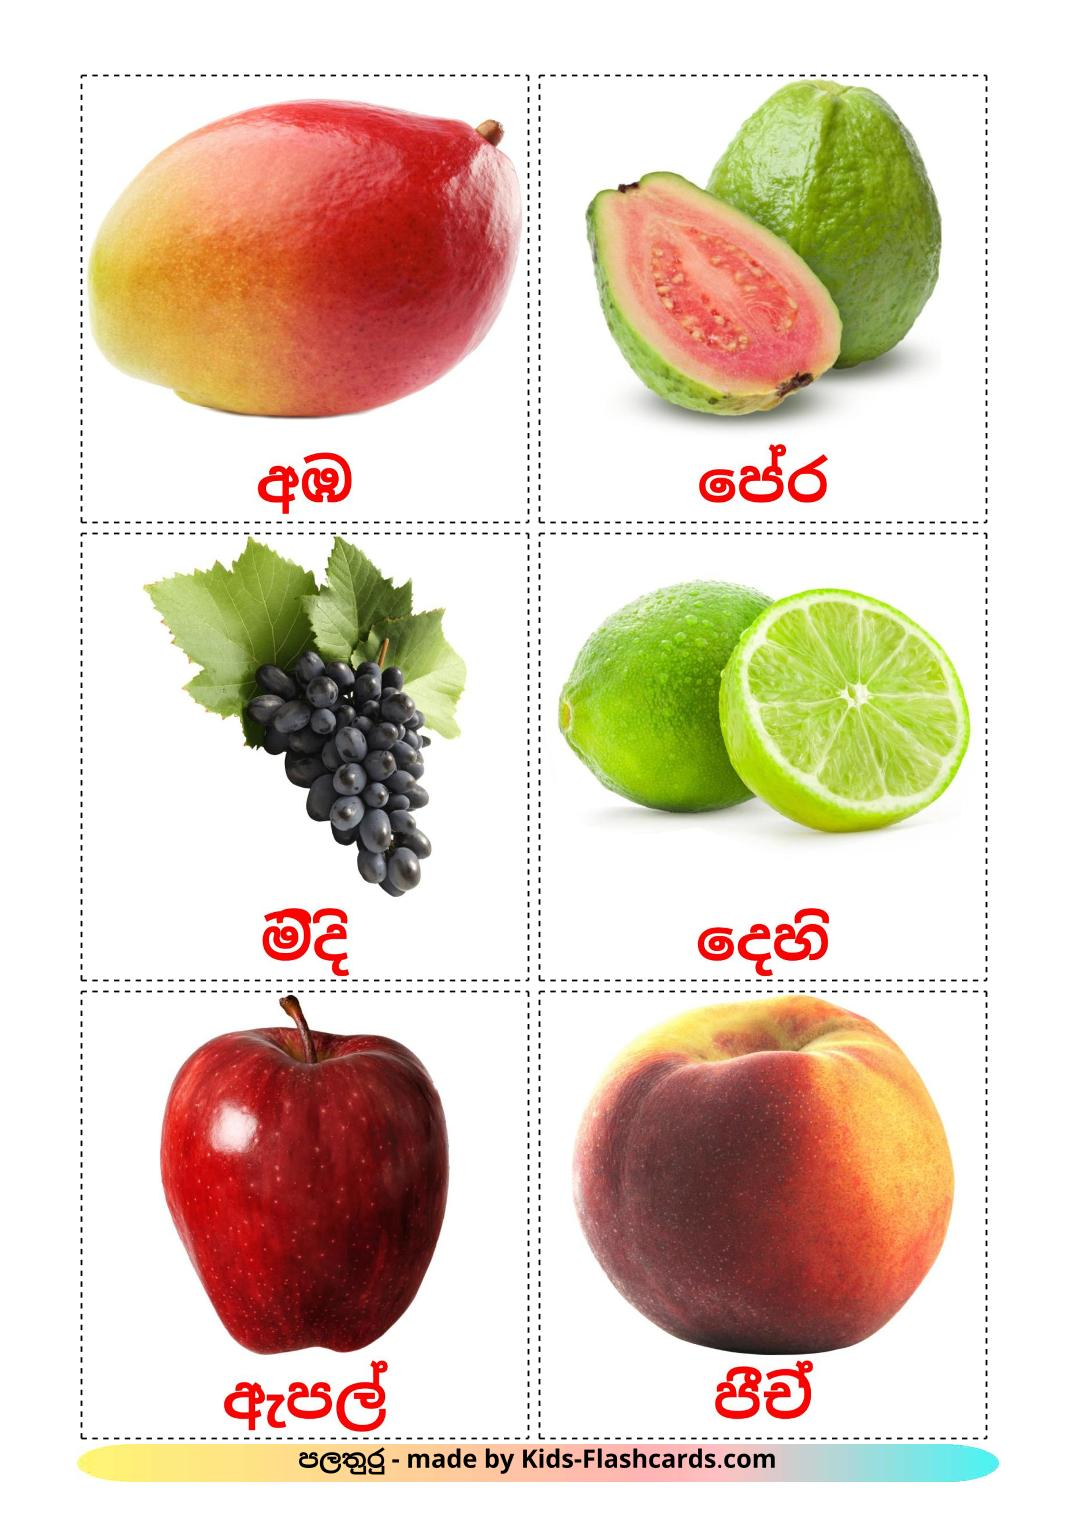 Fruits - 20 Free Printable sinhala Flashcards